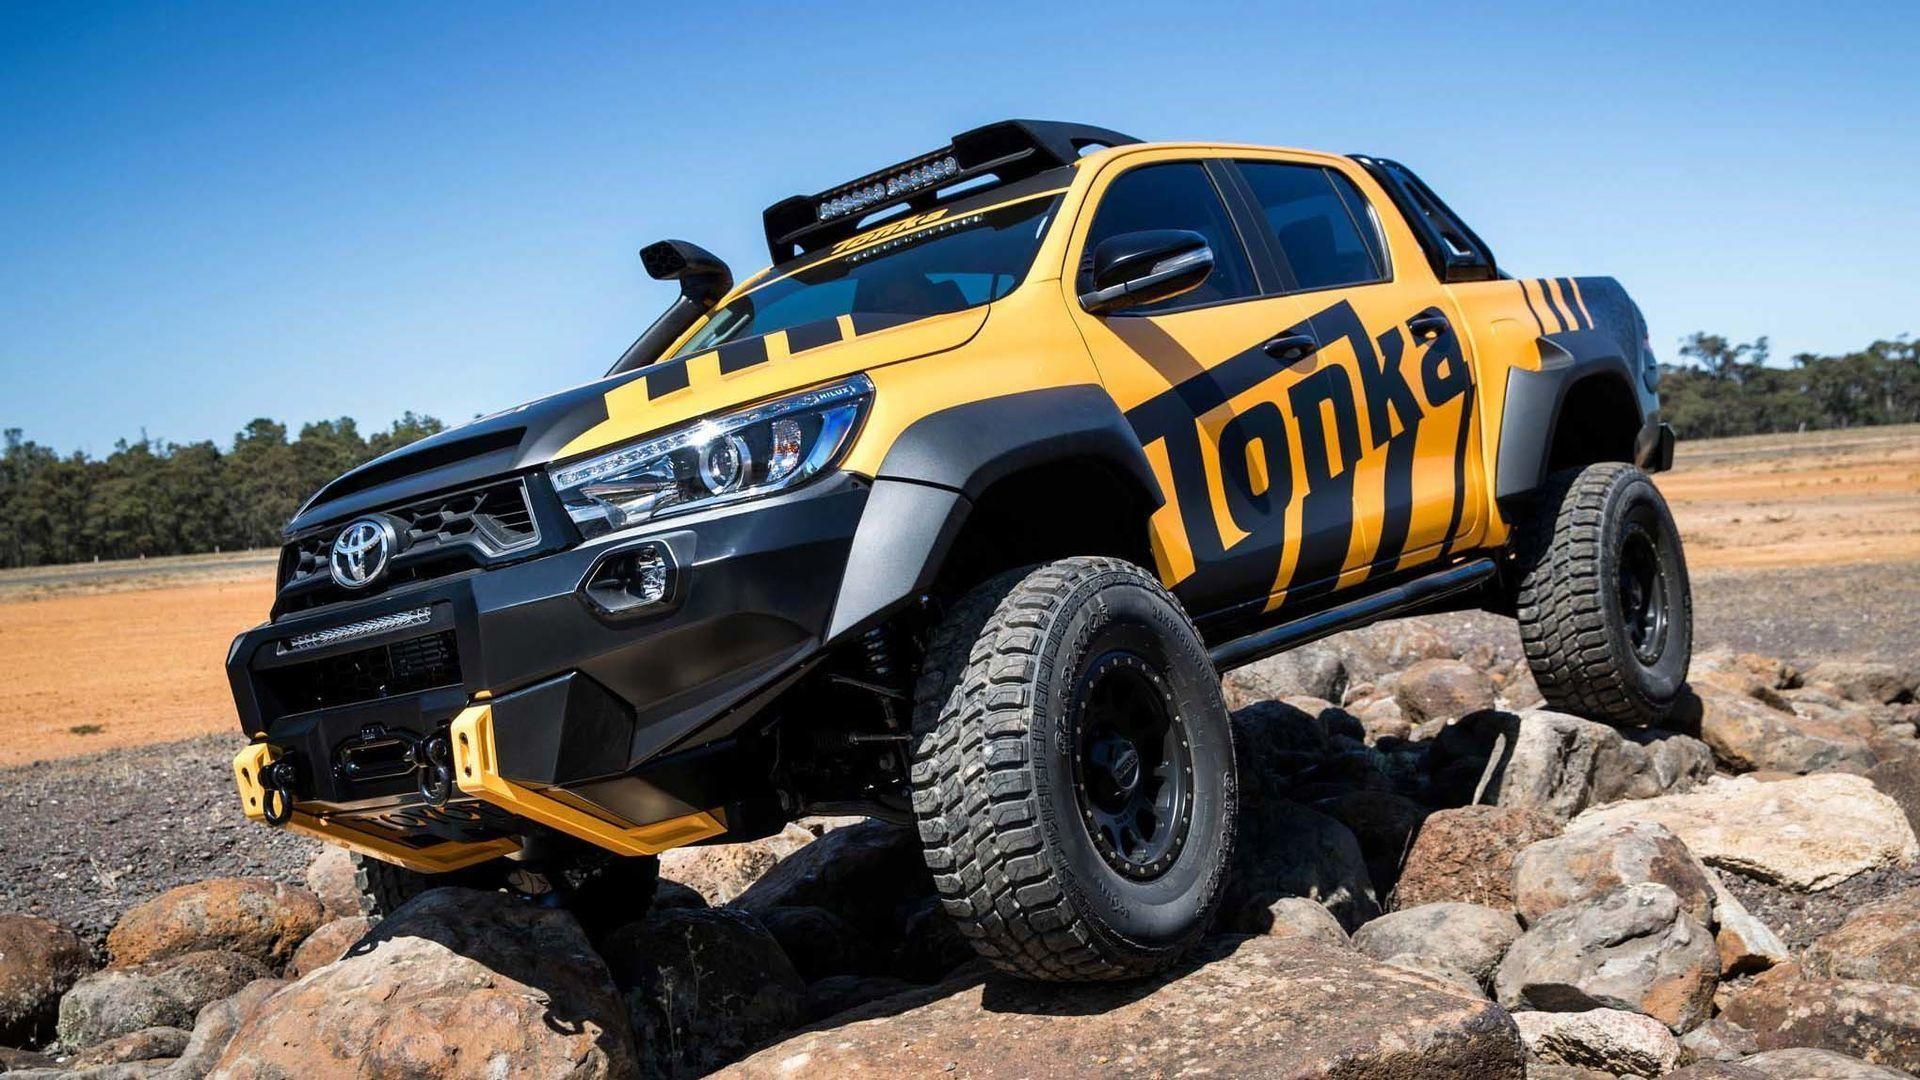 Tonka HiluxY Toyota Concept 6Jeep Camionetas SpUzqMVG